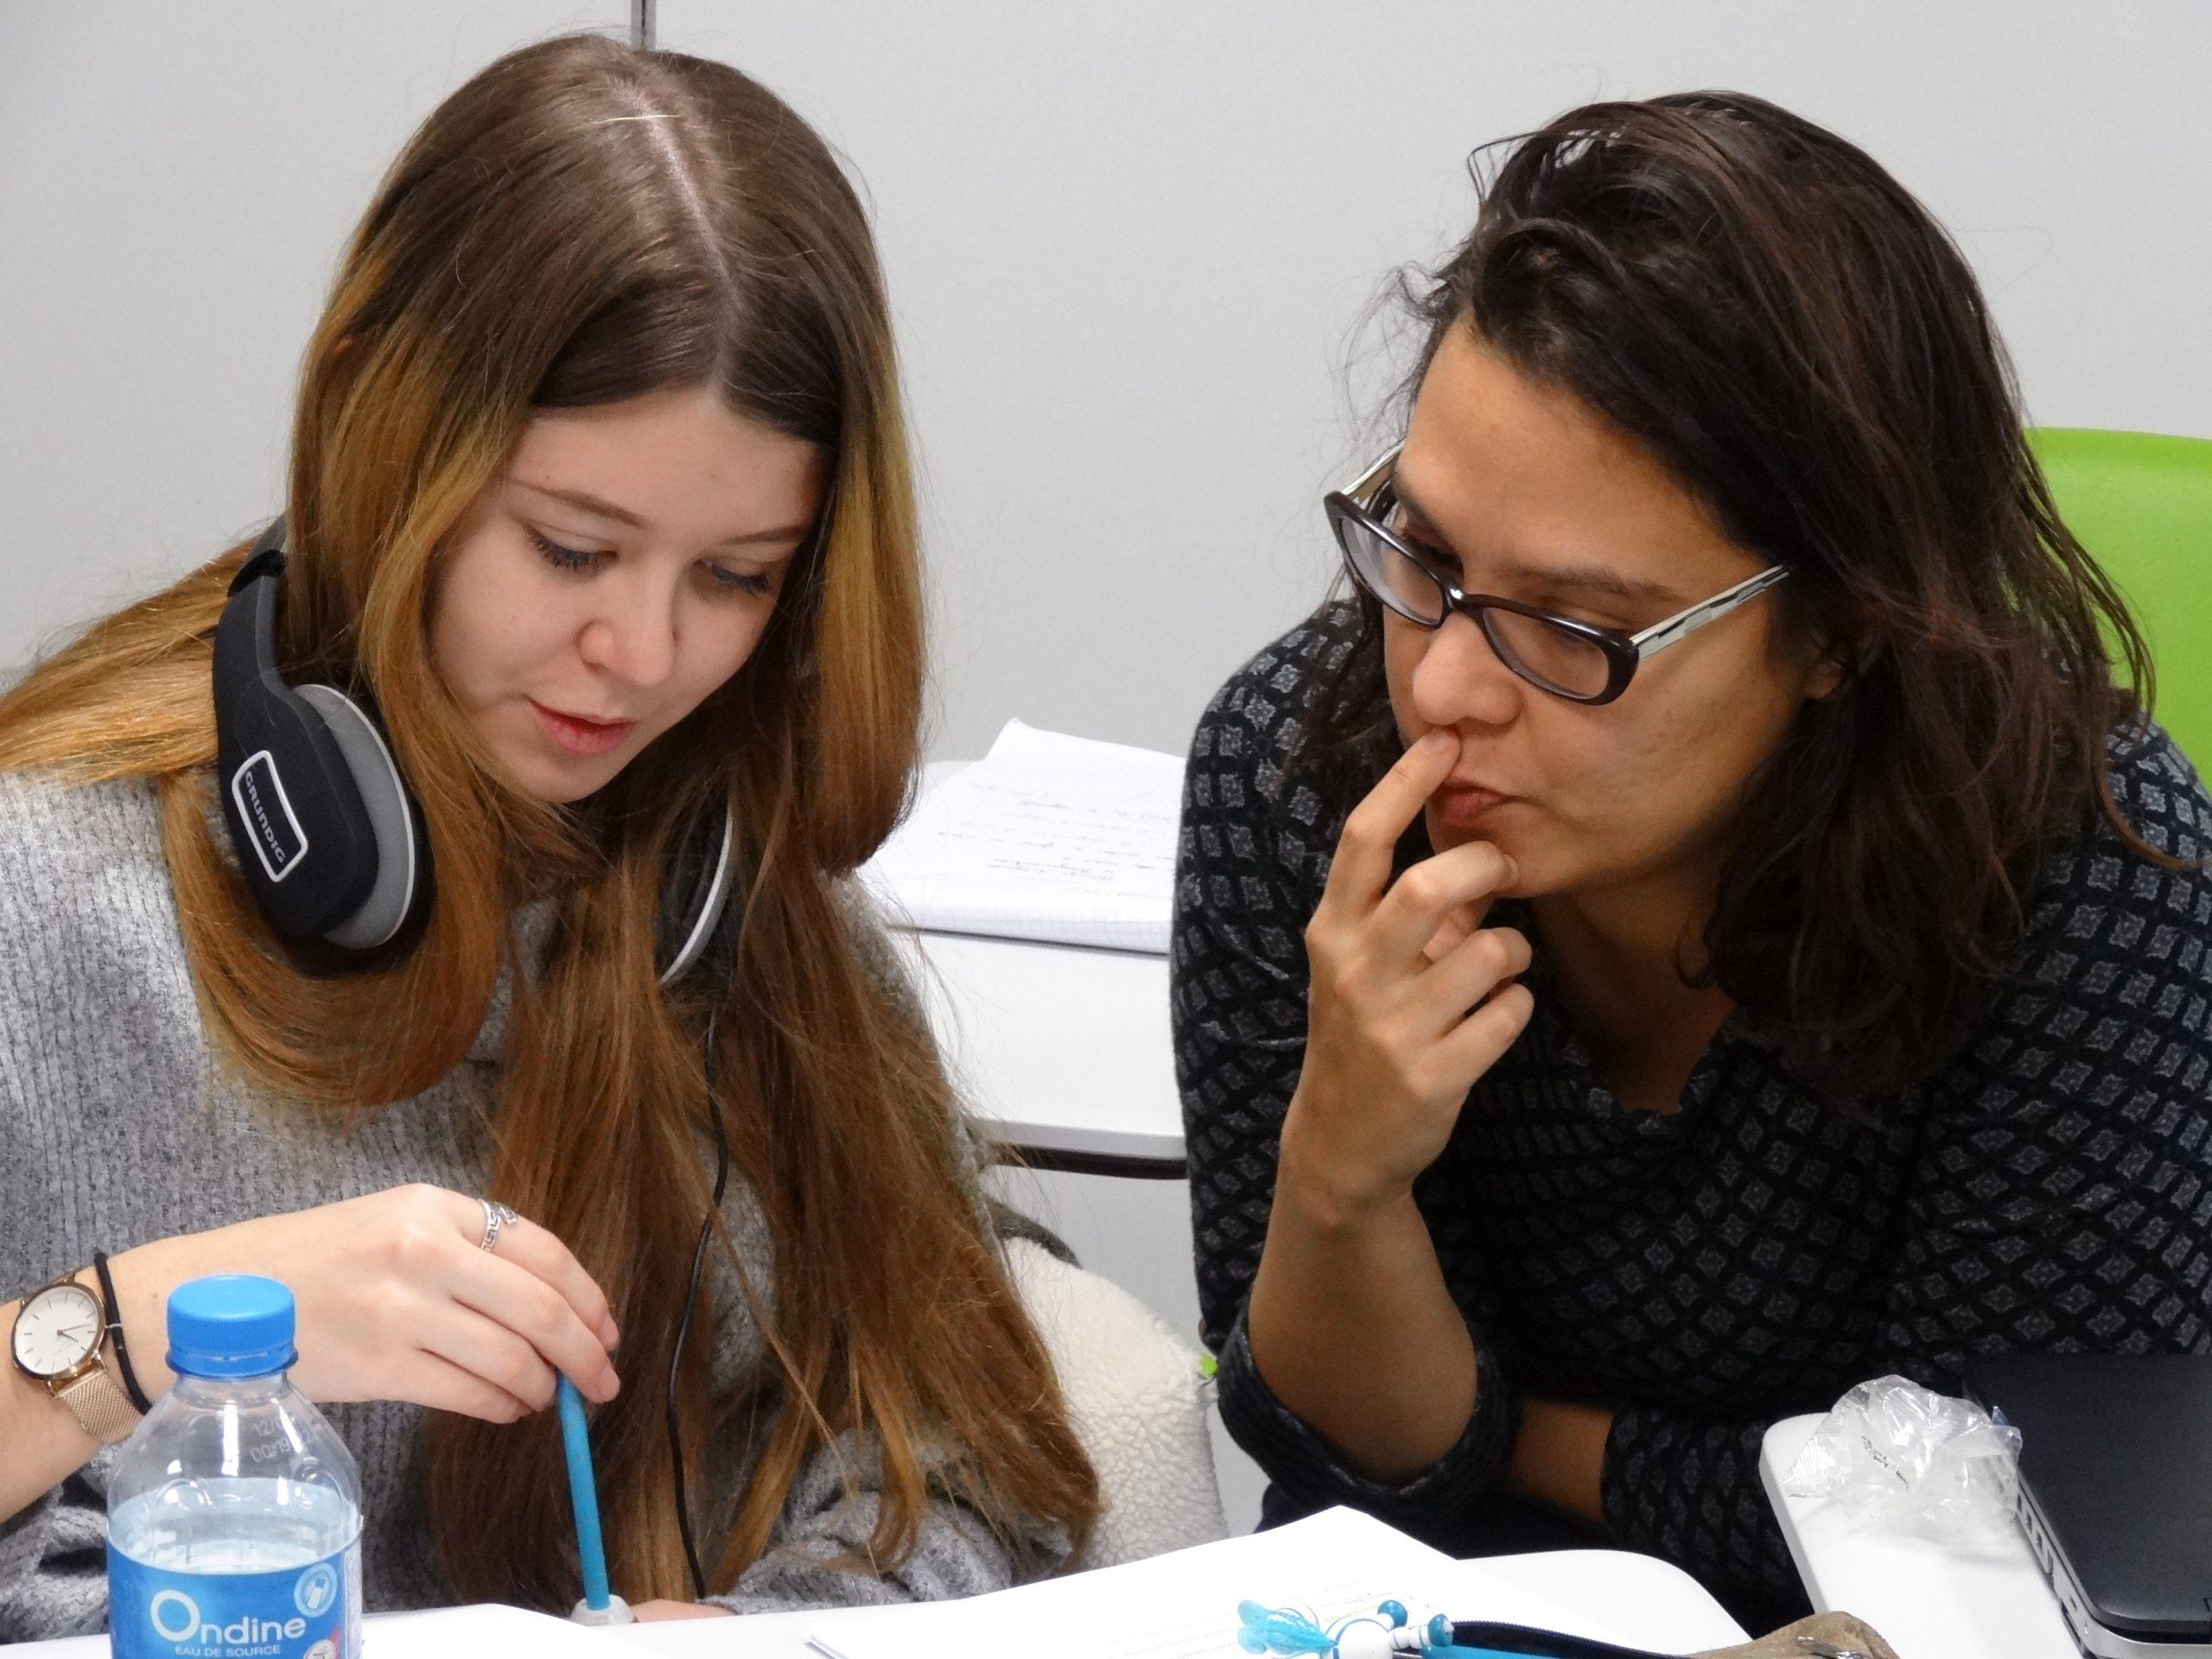 Une enseignante de l'institut qui aide une étudiante